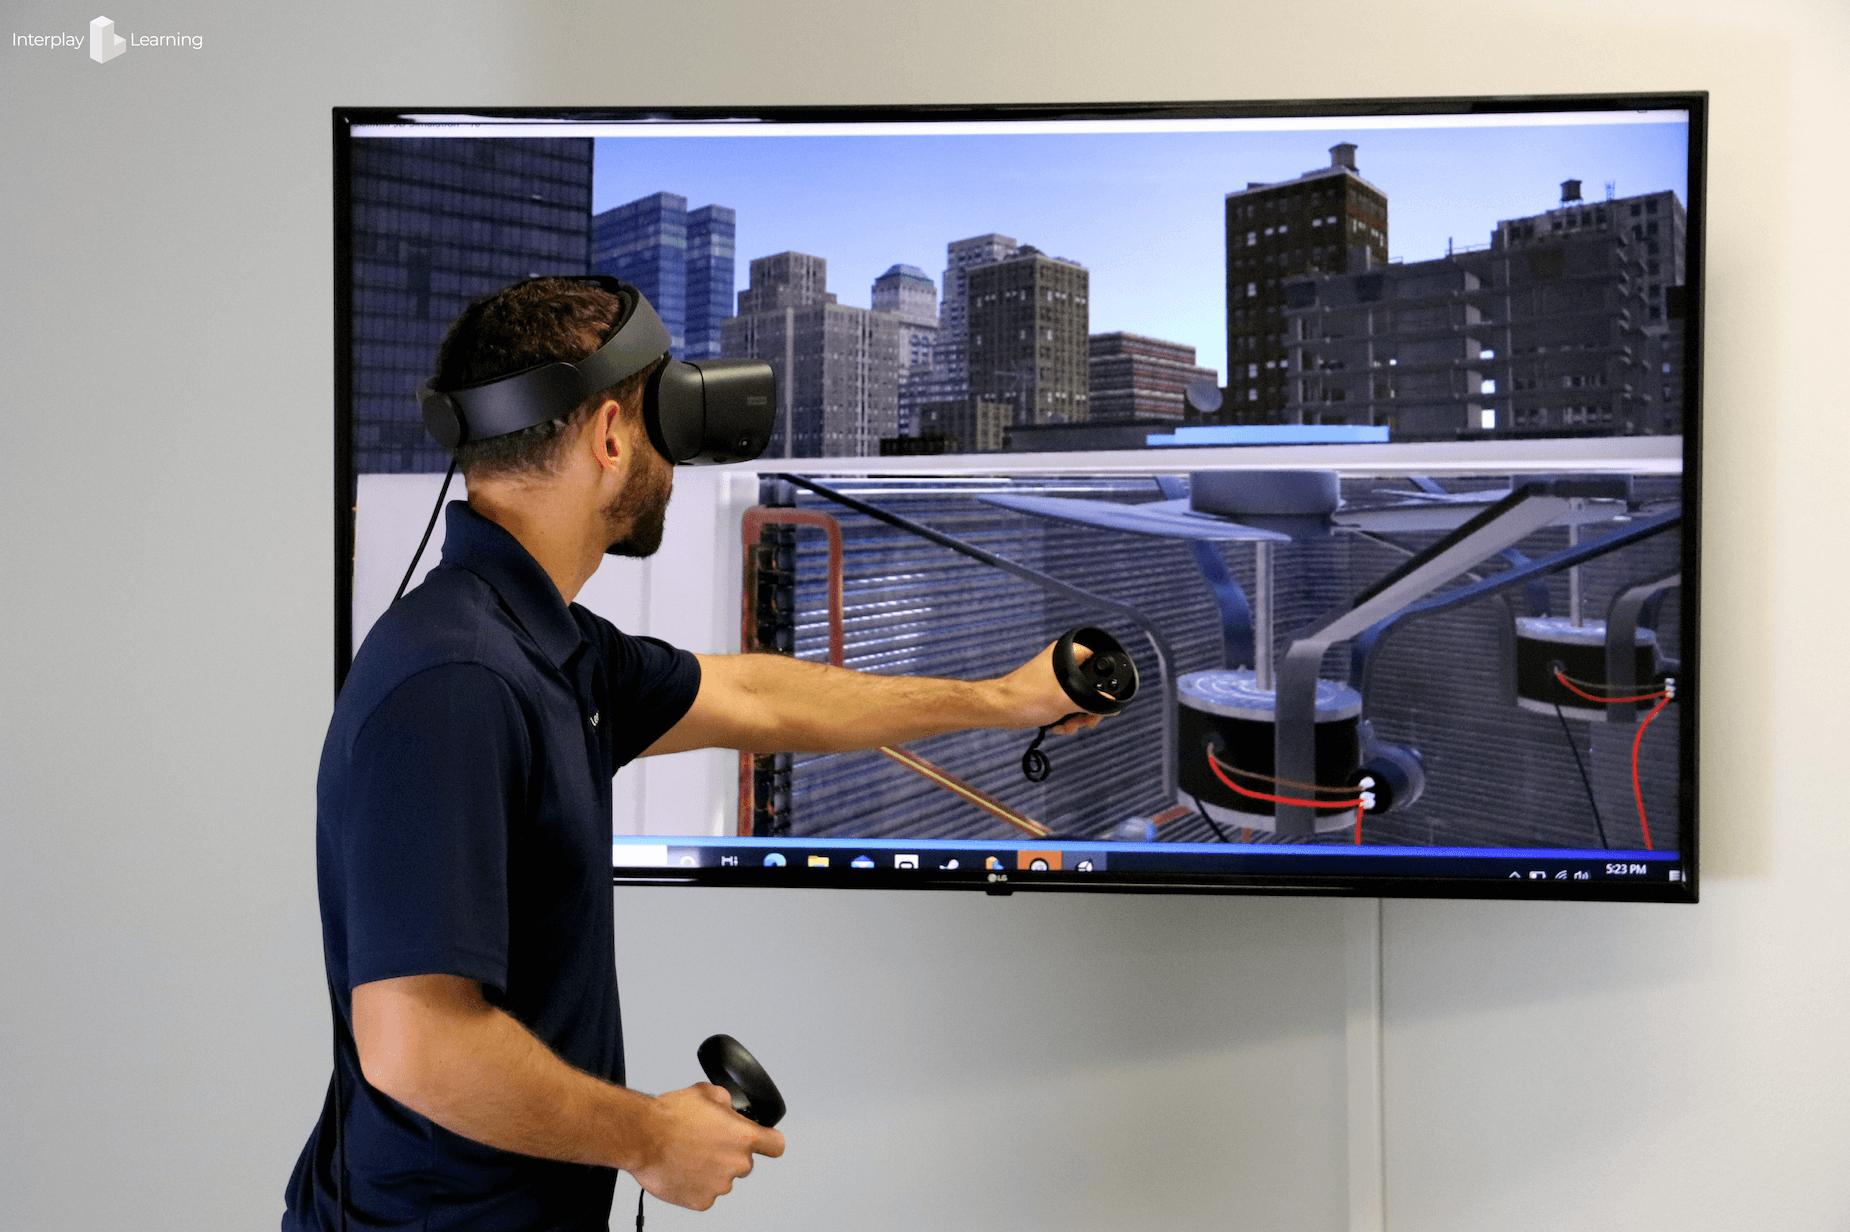 Digital Experiences Modernize HVAC Training - Air Conditioning Blog - Rheem Manufacturing Company